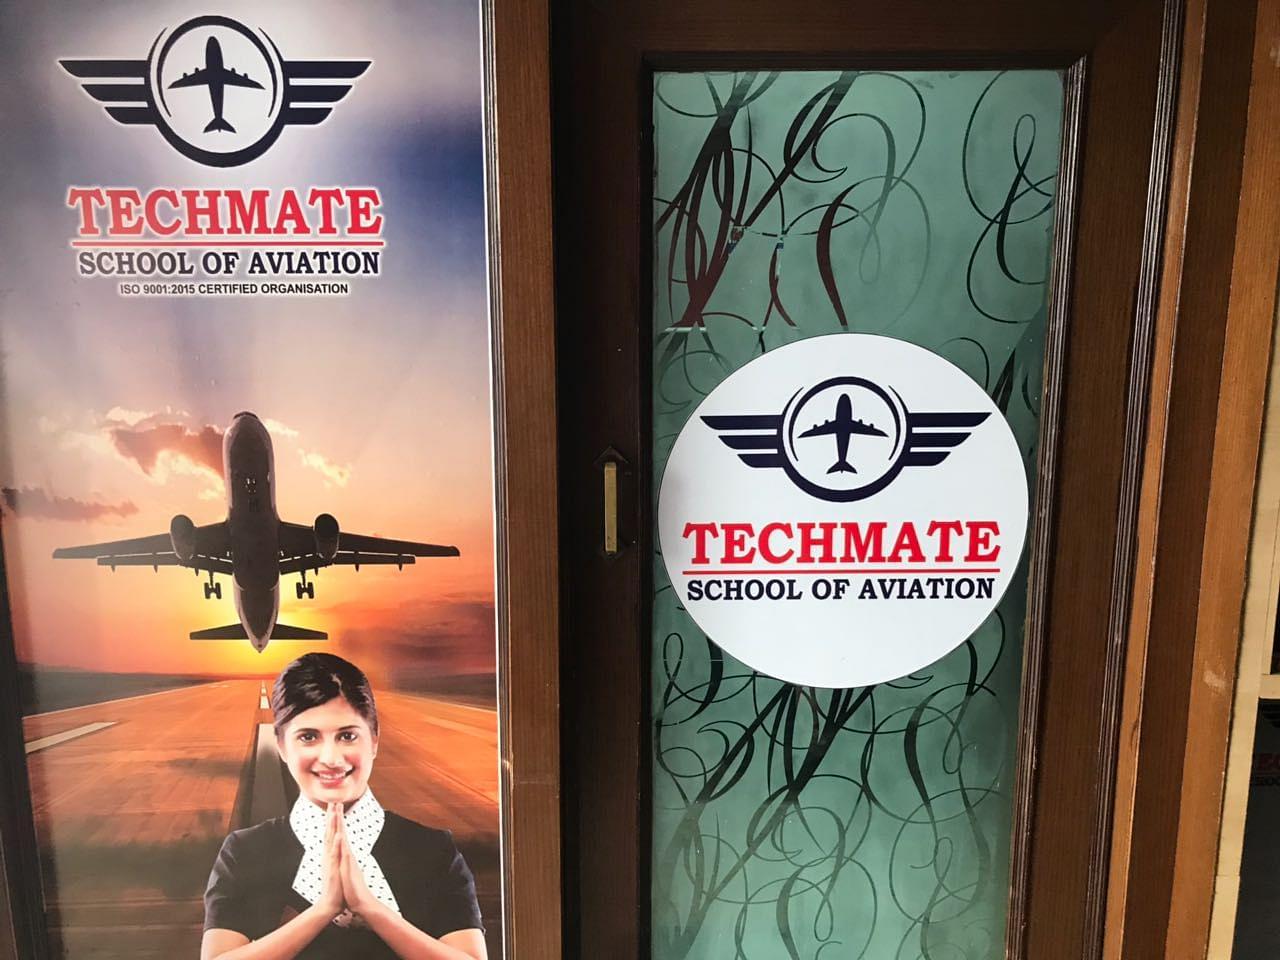 Techmate Institute of Aviation